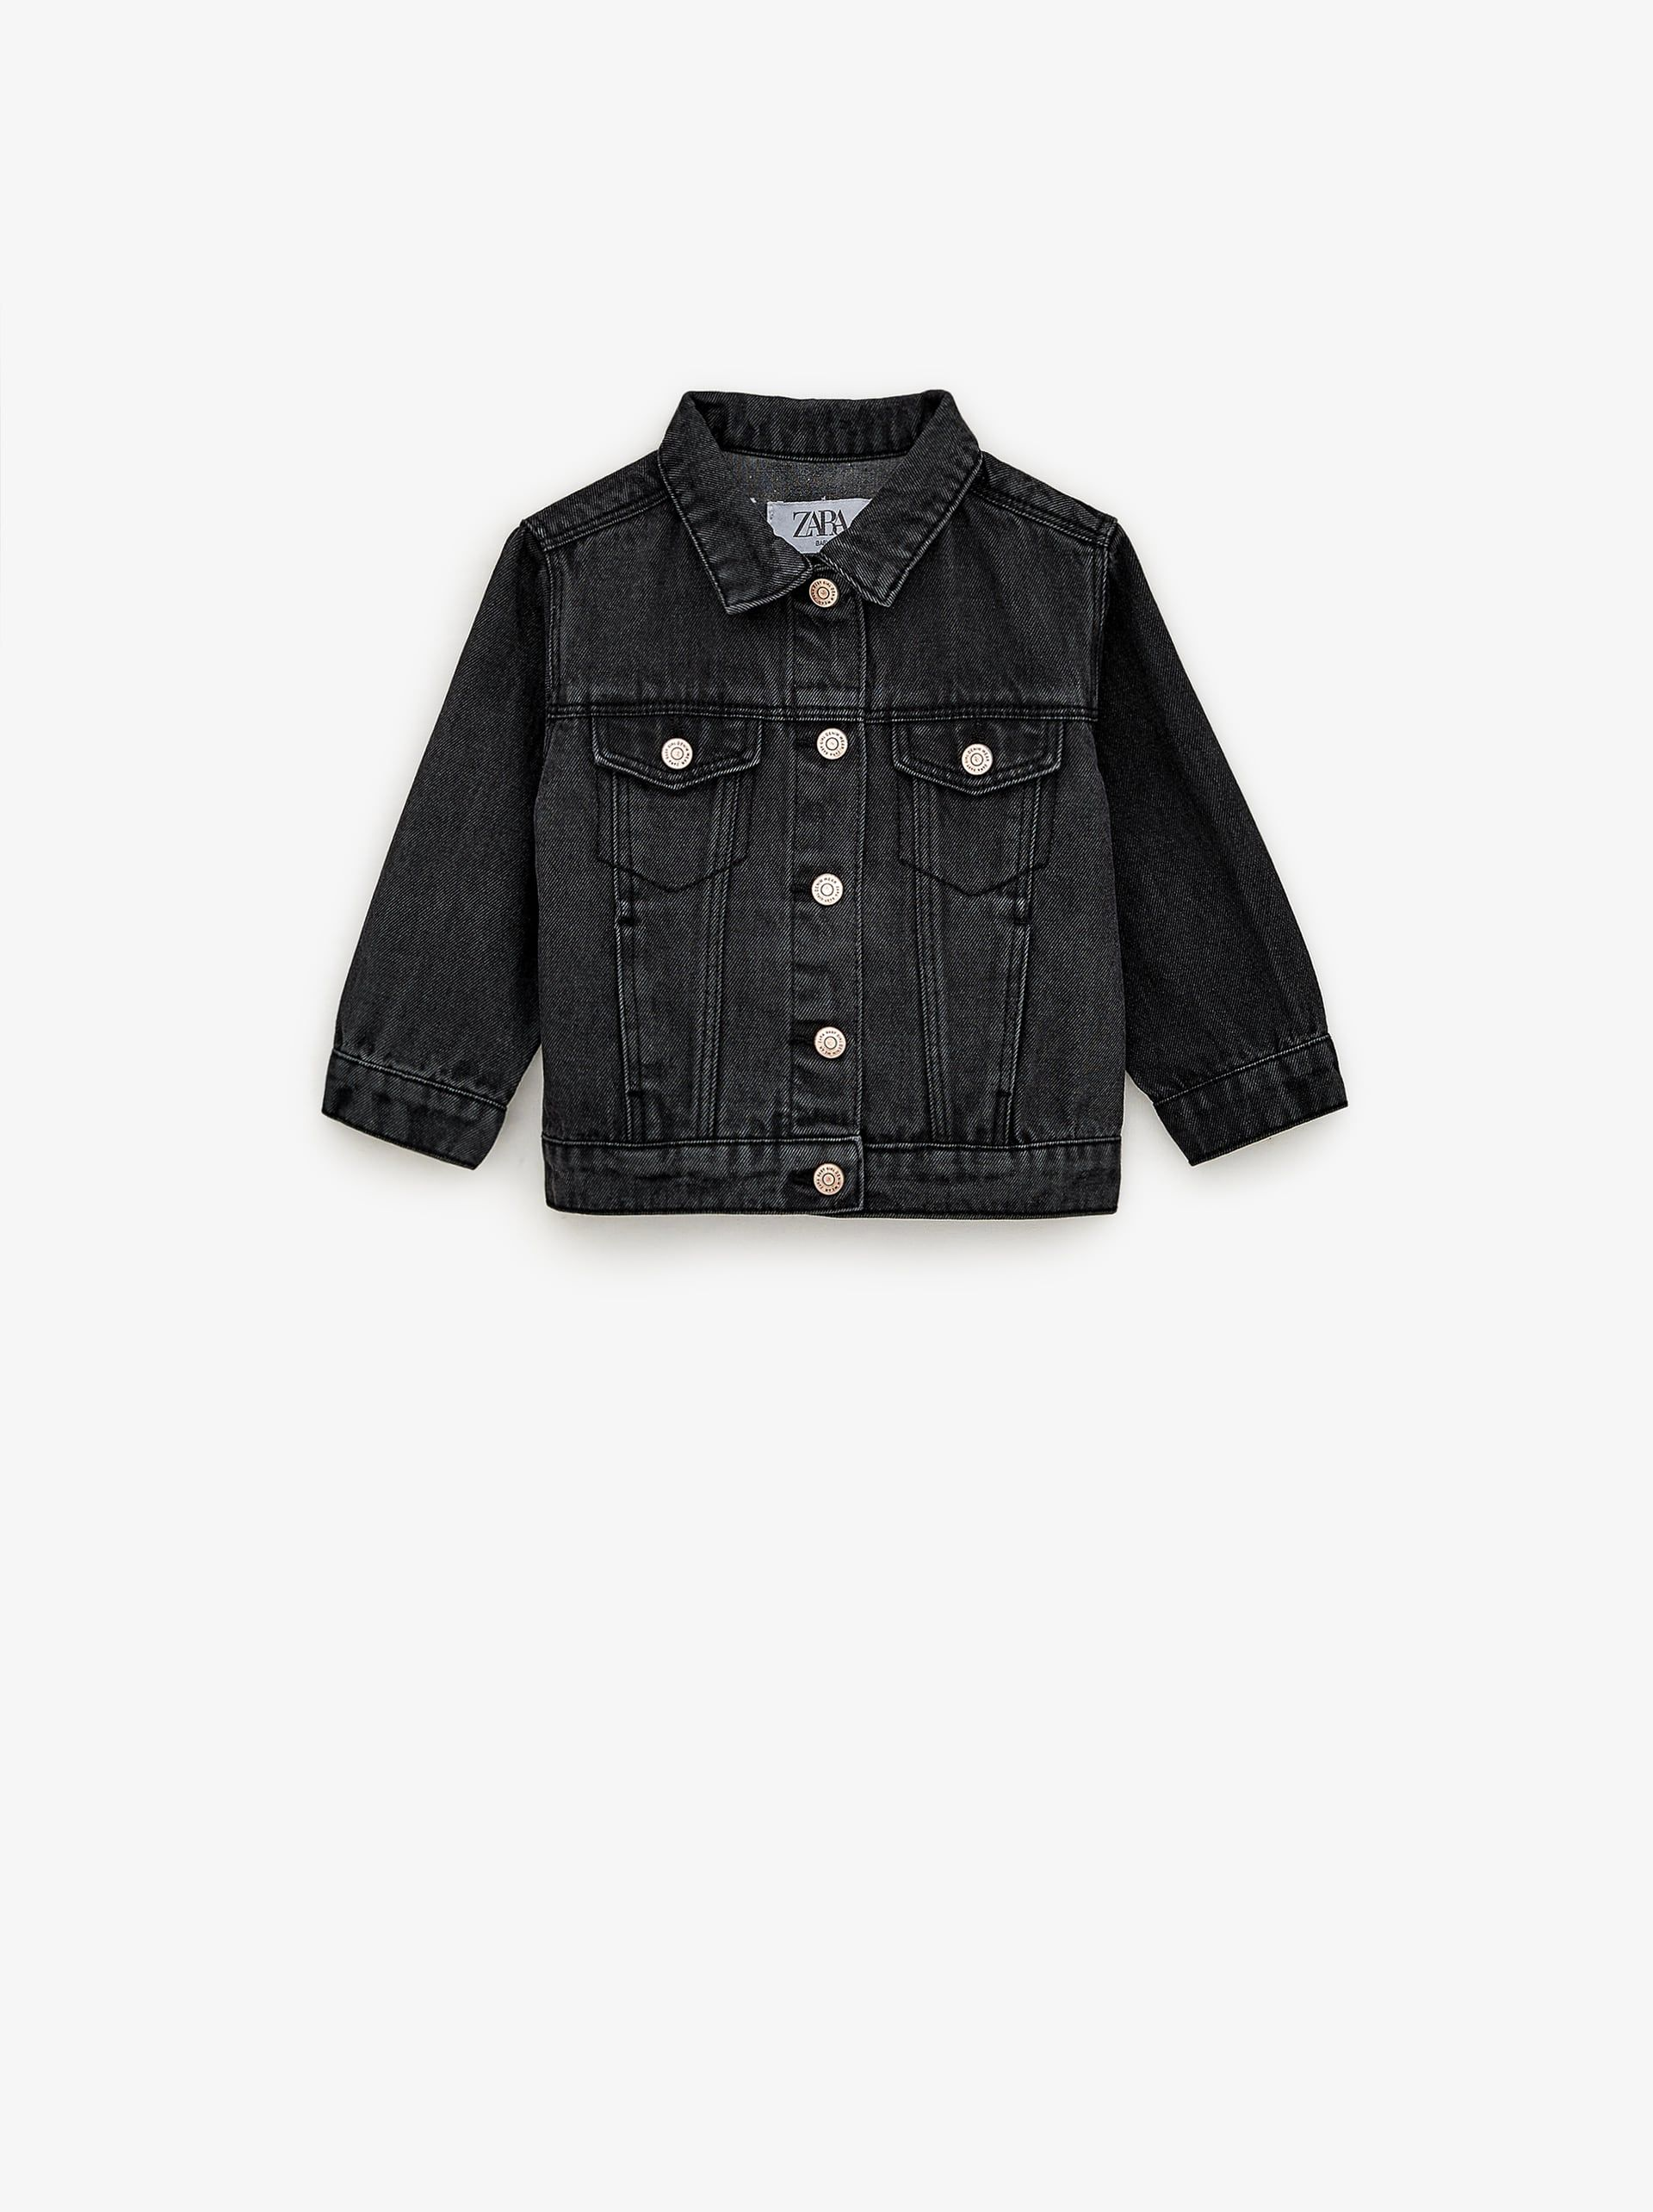 Basic Denim Jacket New In Baby Girl 3 Months 5 Years Kids Zara United States Denim Jacket Black Jeans Boys Jackets [ 2569 x 1920 Pixel ]